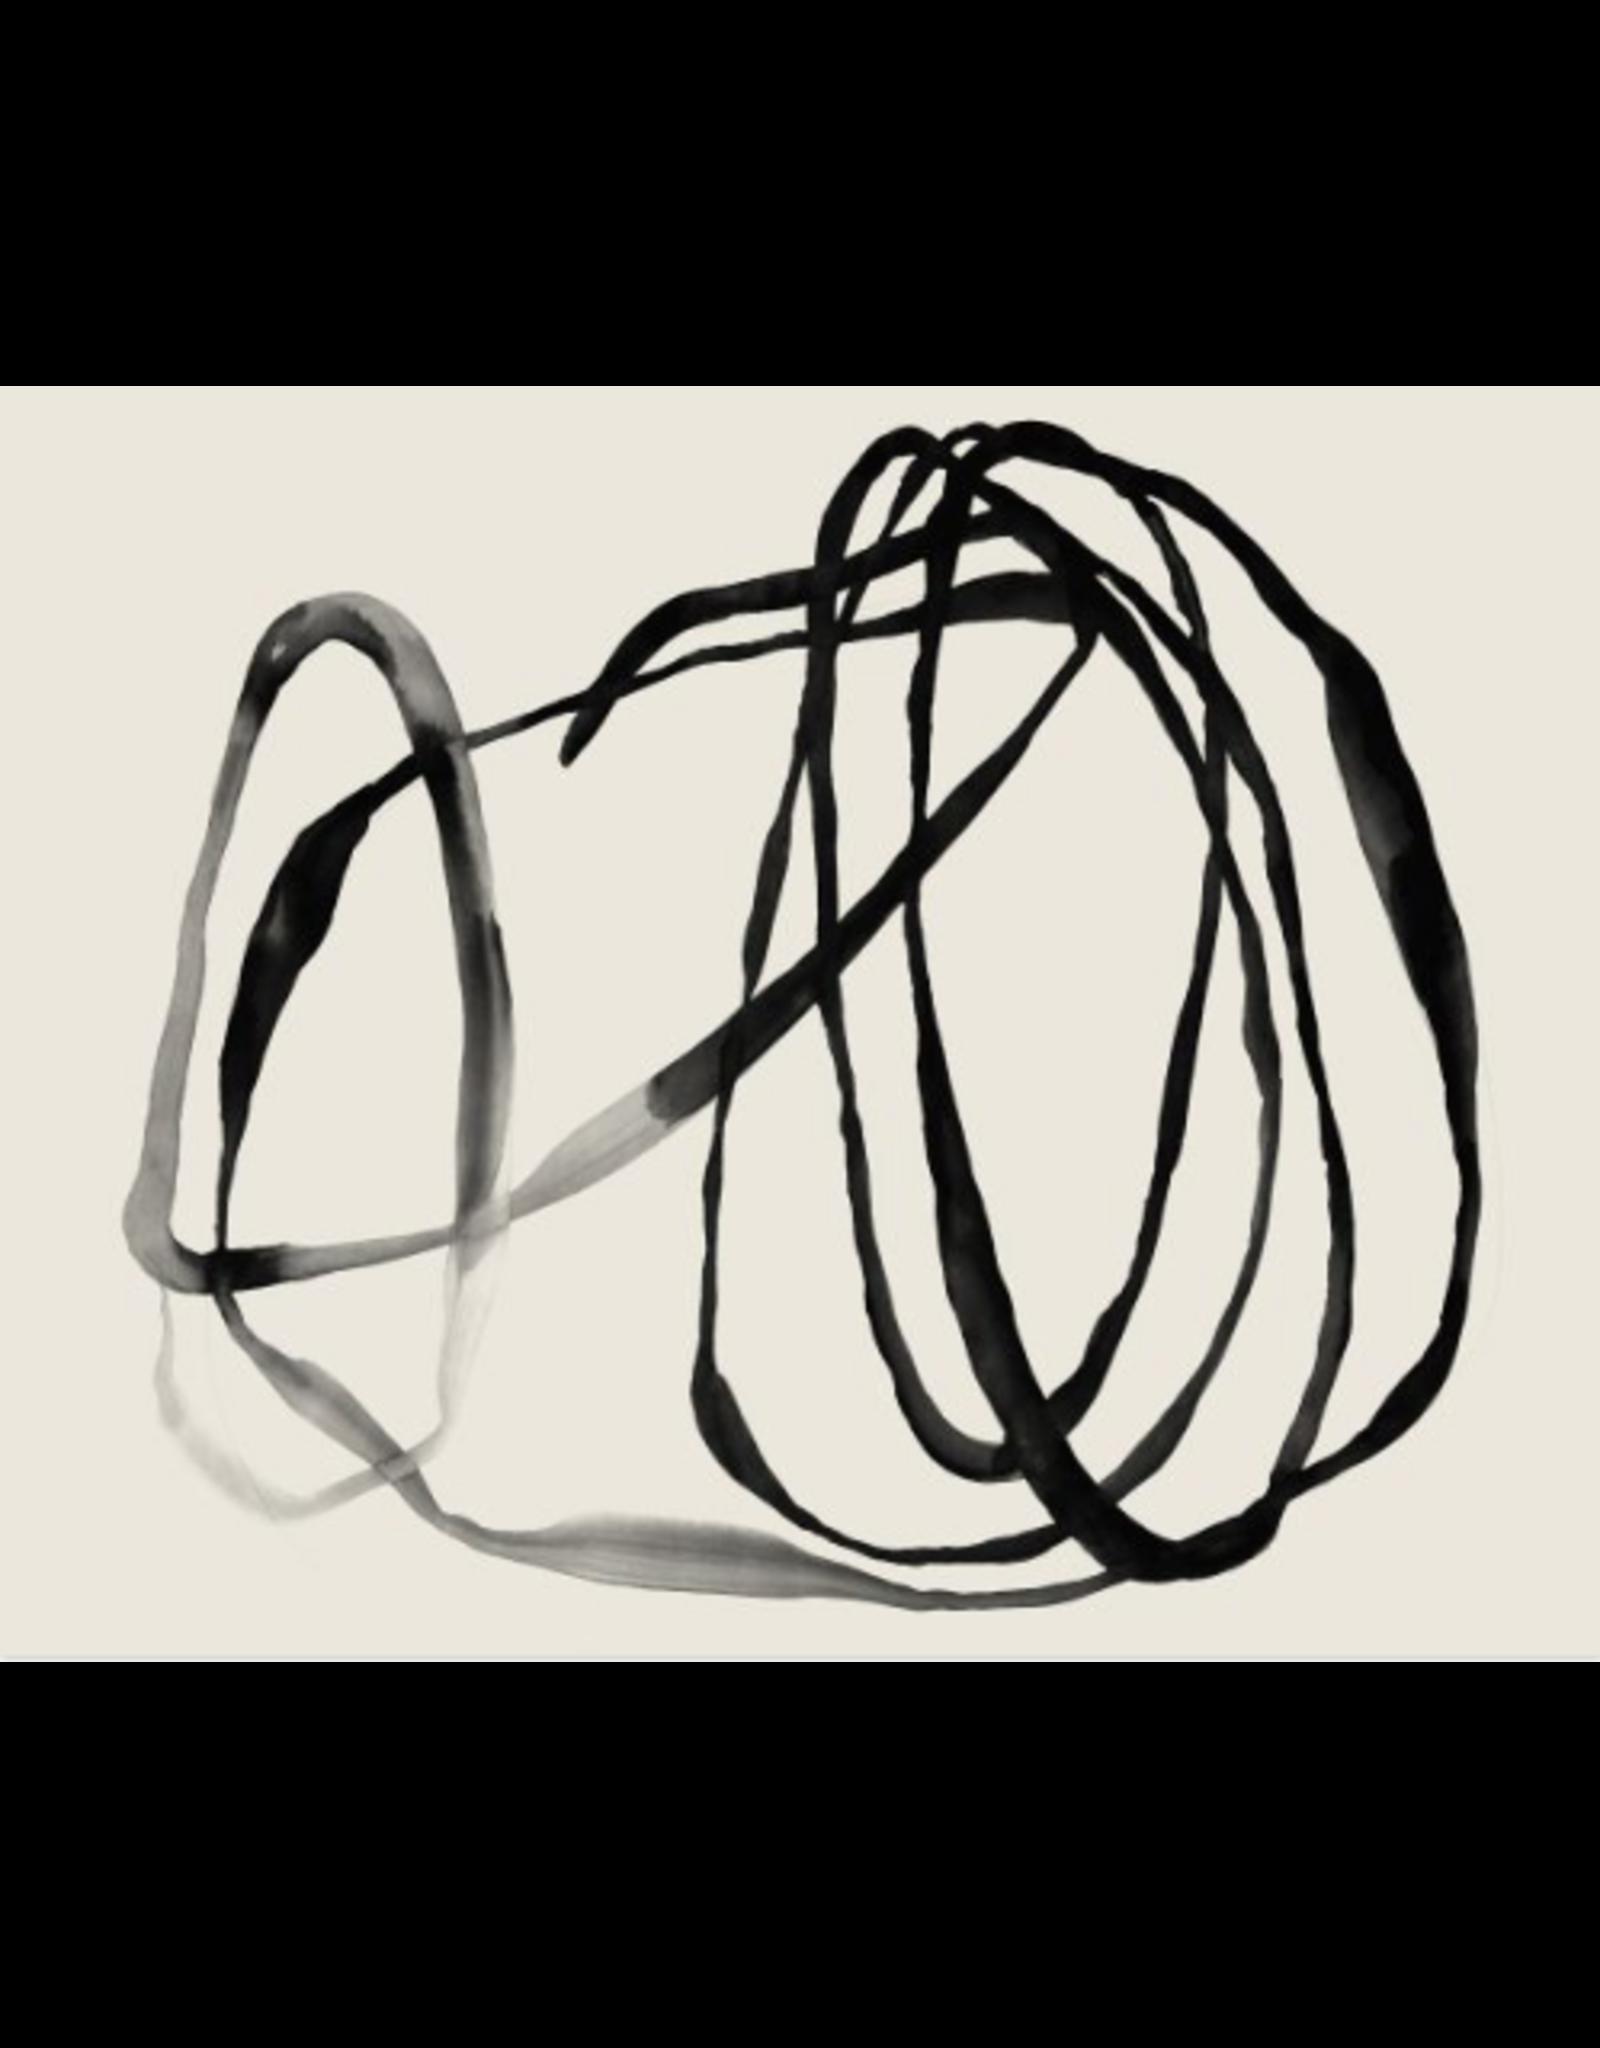 Motion in Lines II